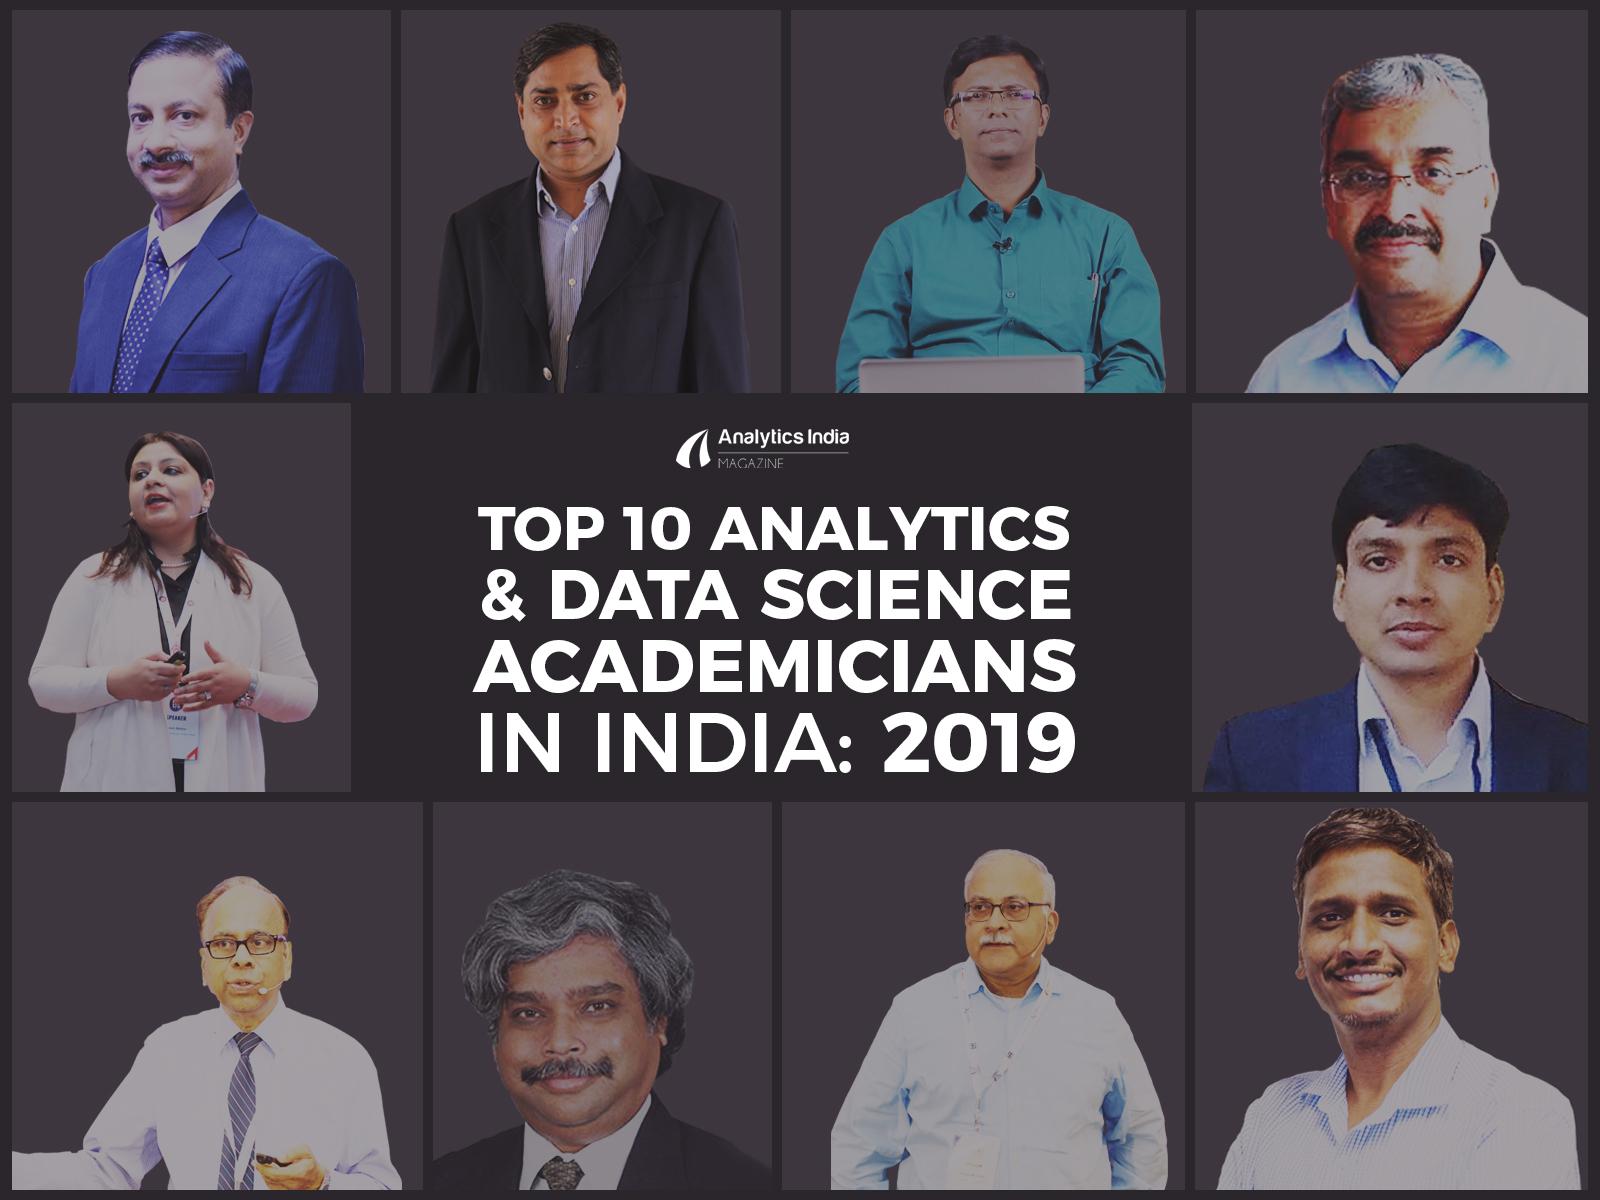 ☝️ Best online dating data science degree degrees 2019